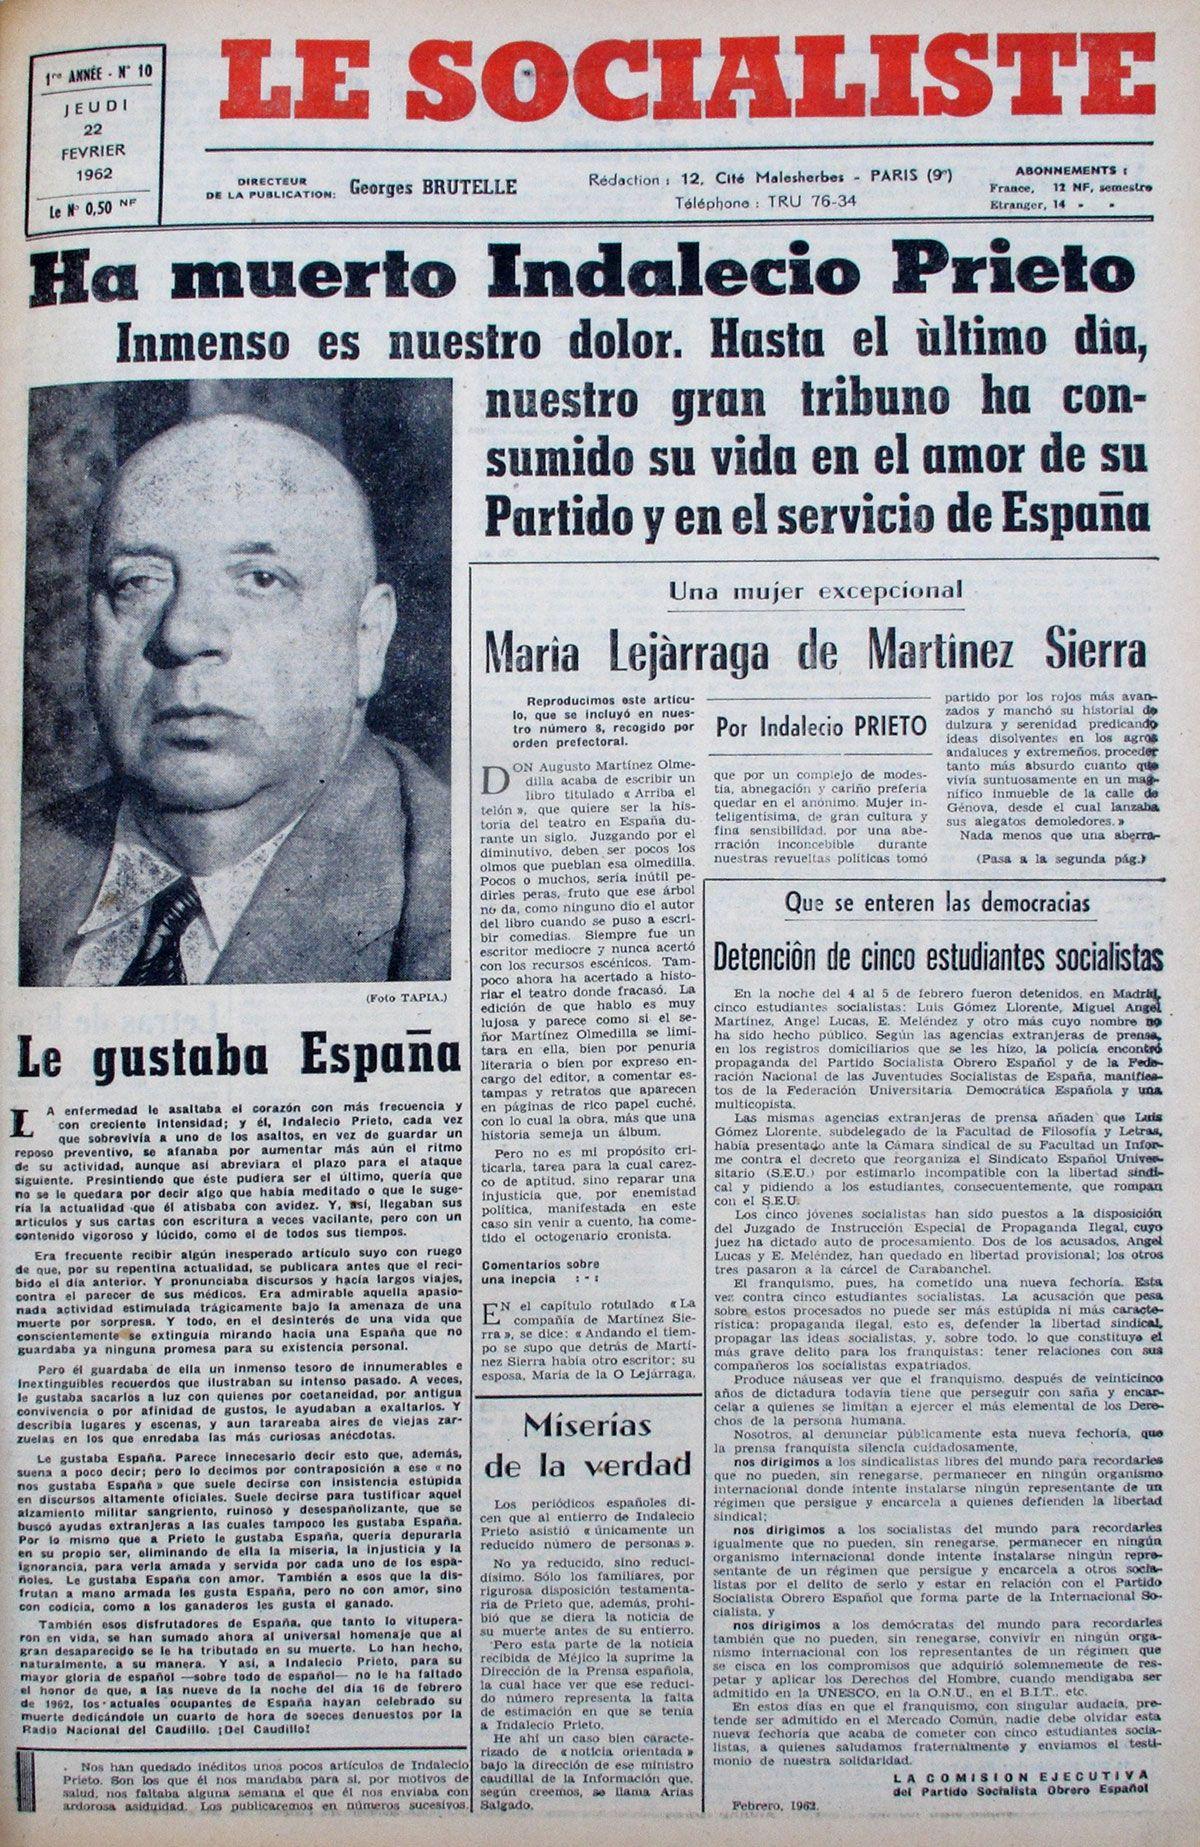 Muerte de Indalecio Prieto